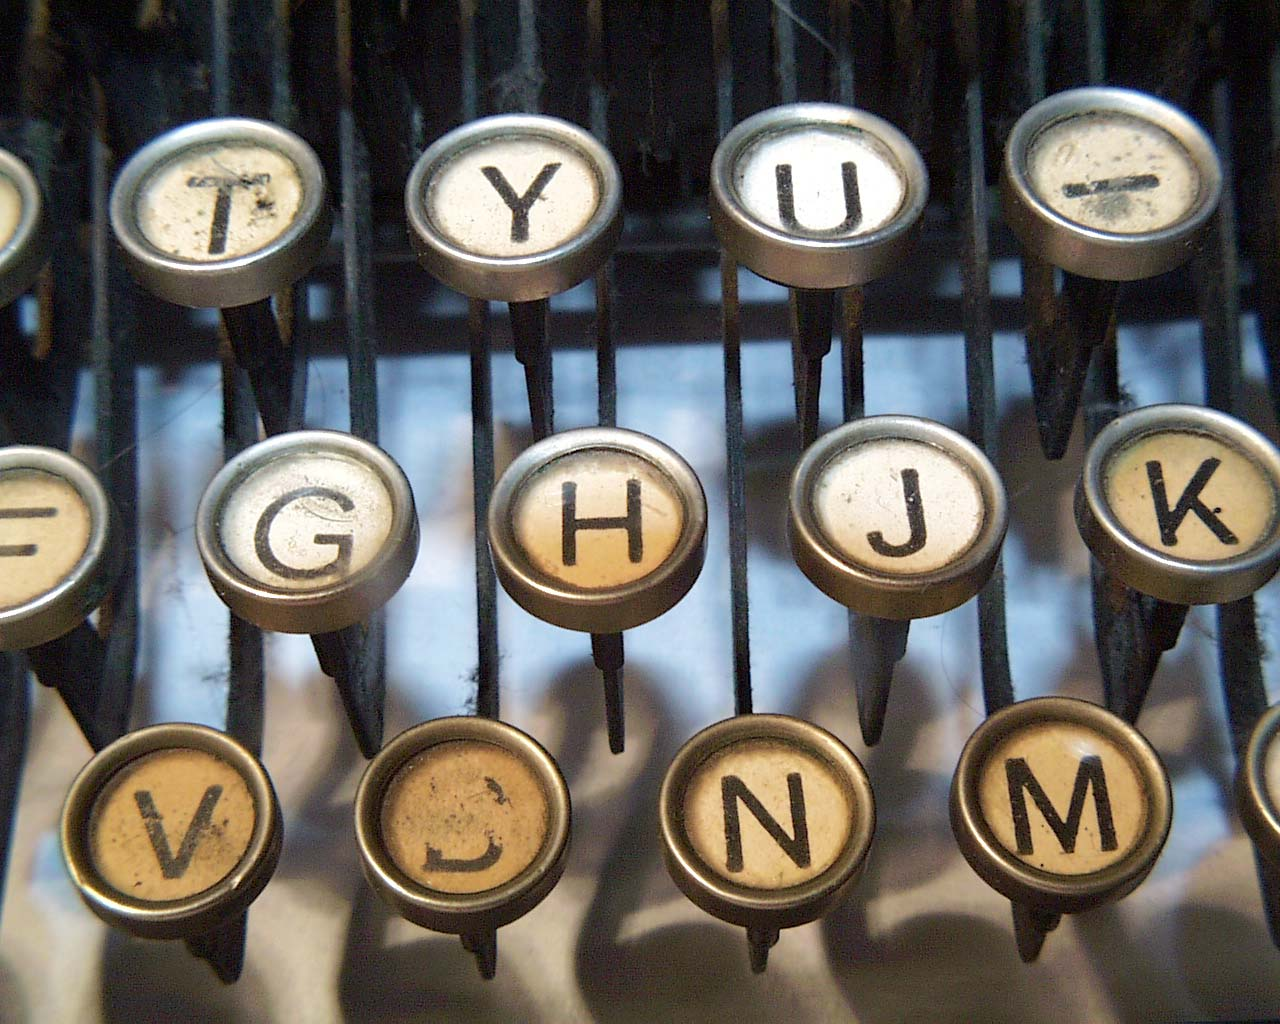 http://aurorameyer.files.wordpress.com/2010/08/typewriter.jpg